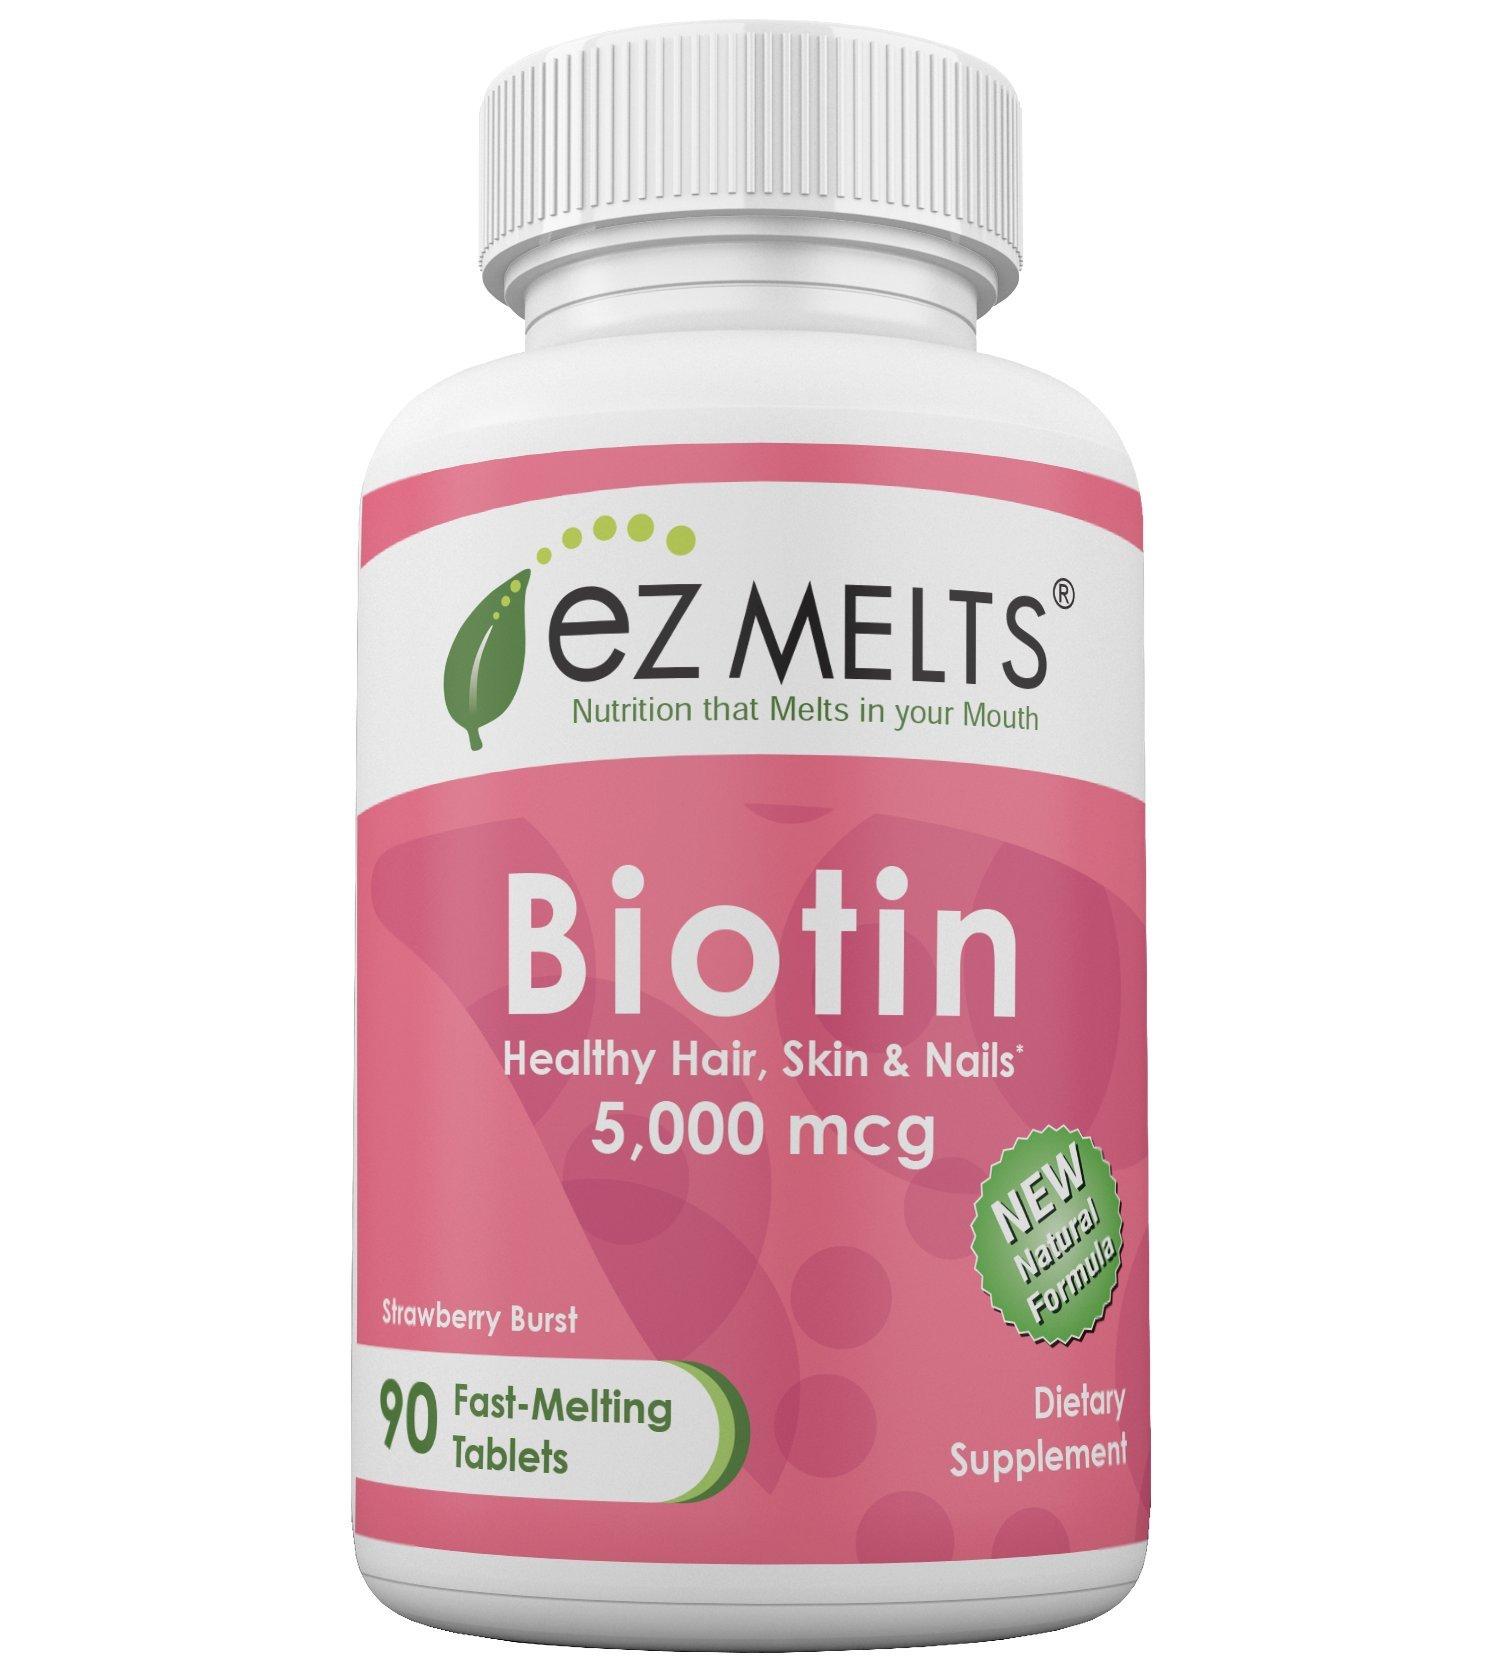 EZ Melts Biotin, 5,000 mcg, Dissolvable Vitamins, Vegan, Zero Sugar, Natural Strawberry Flavor, 90 Fast Melting Tablets, Biotin Supplement